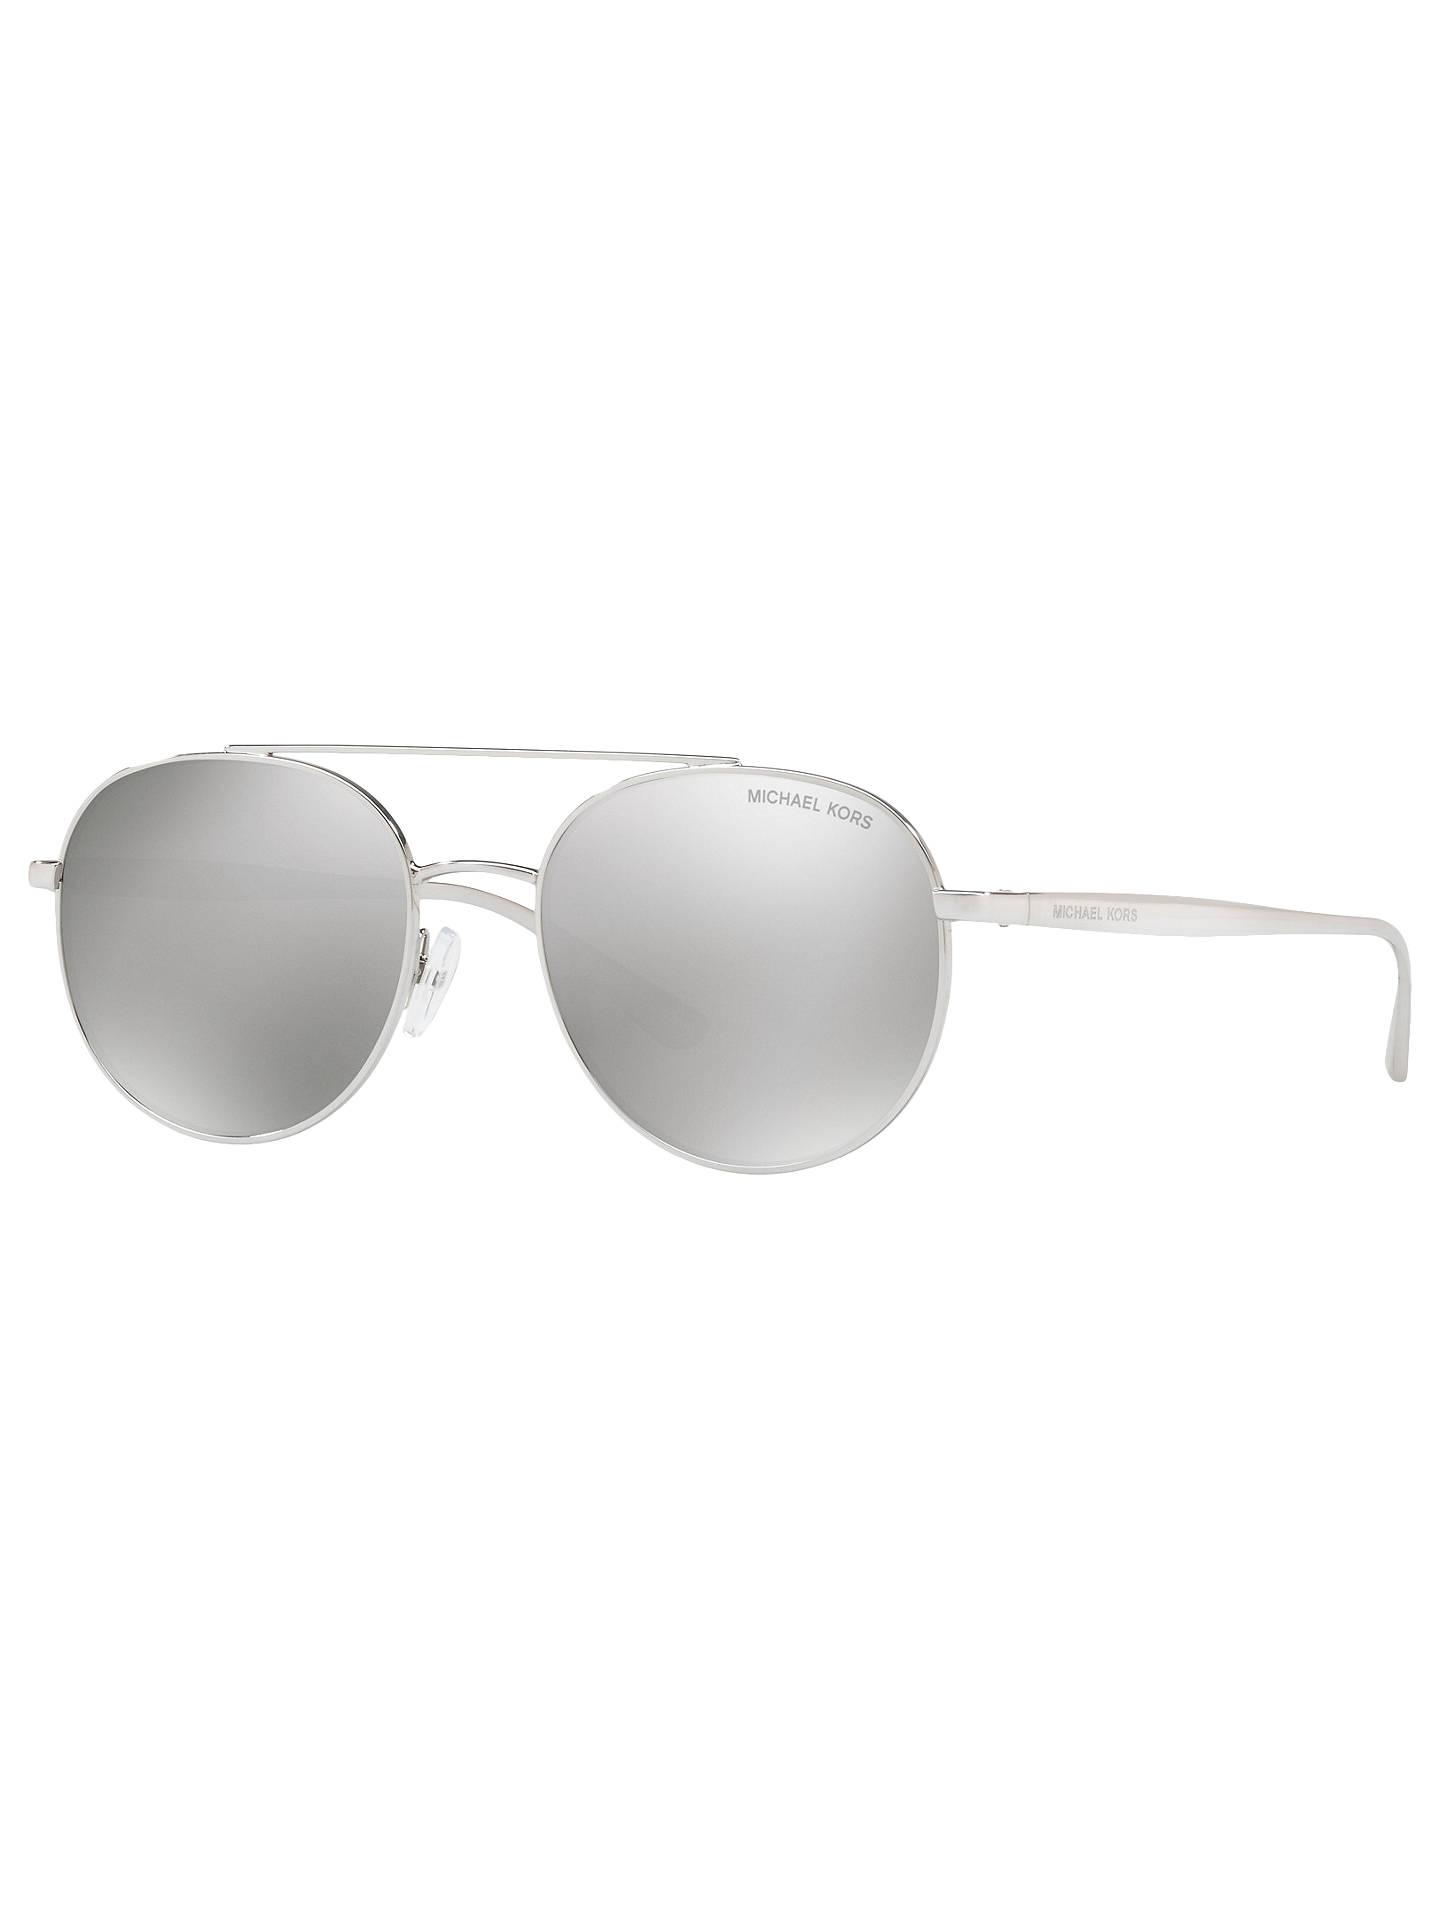 e5beb2cfd0eb Buy Michael Kors MK1021 Lon Round Aviator Sunglasses, Silver/Mirror Grey  Online at johnlewis ...